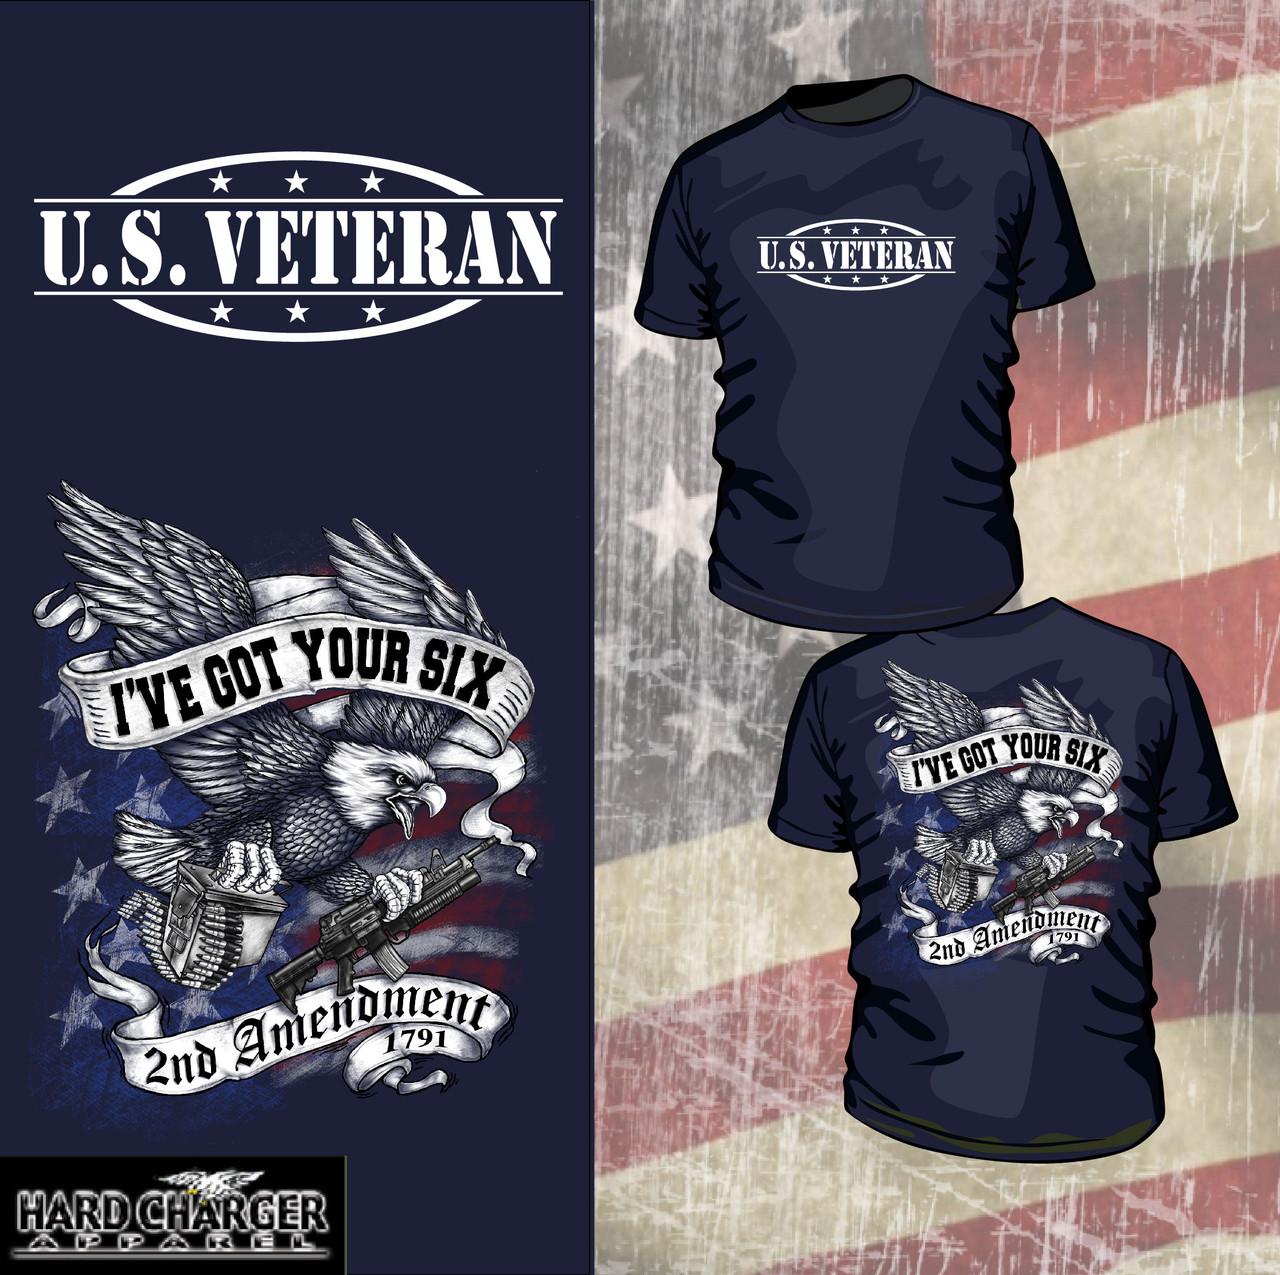 2nd Amendment - U.S. Veteran shirt - Hard Charger Apparel f237bf7f7e2e